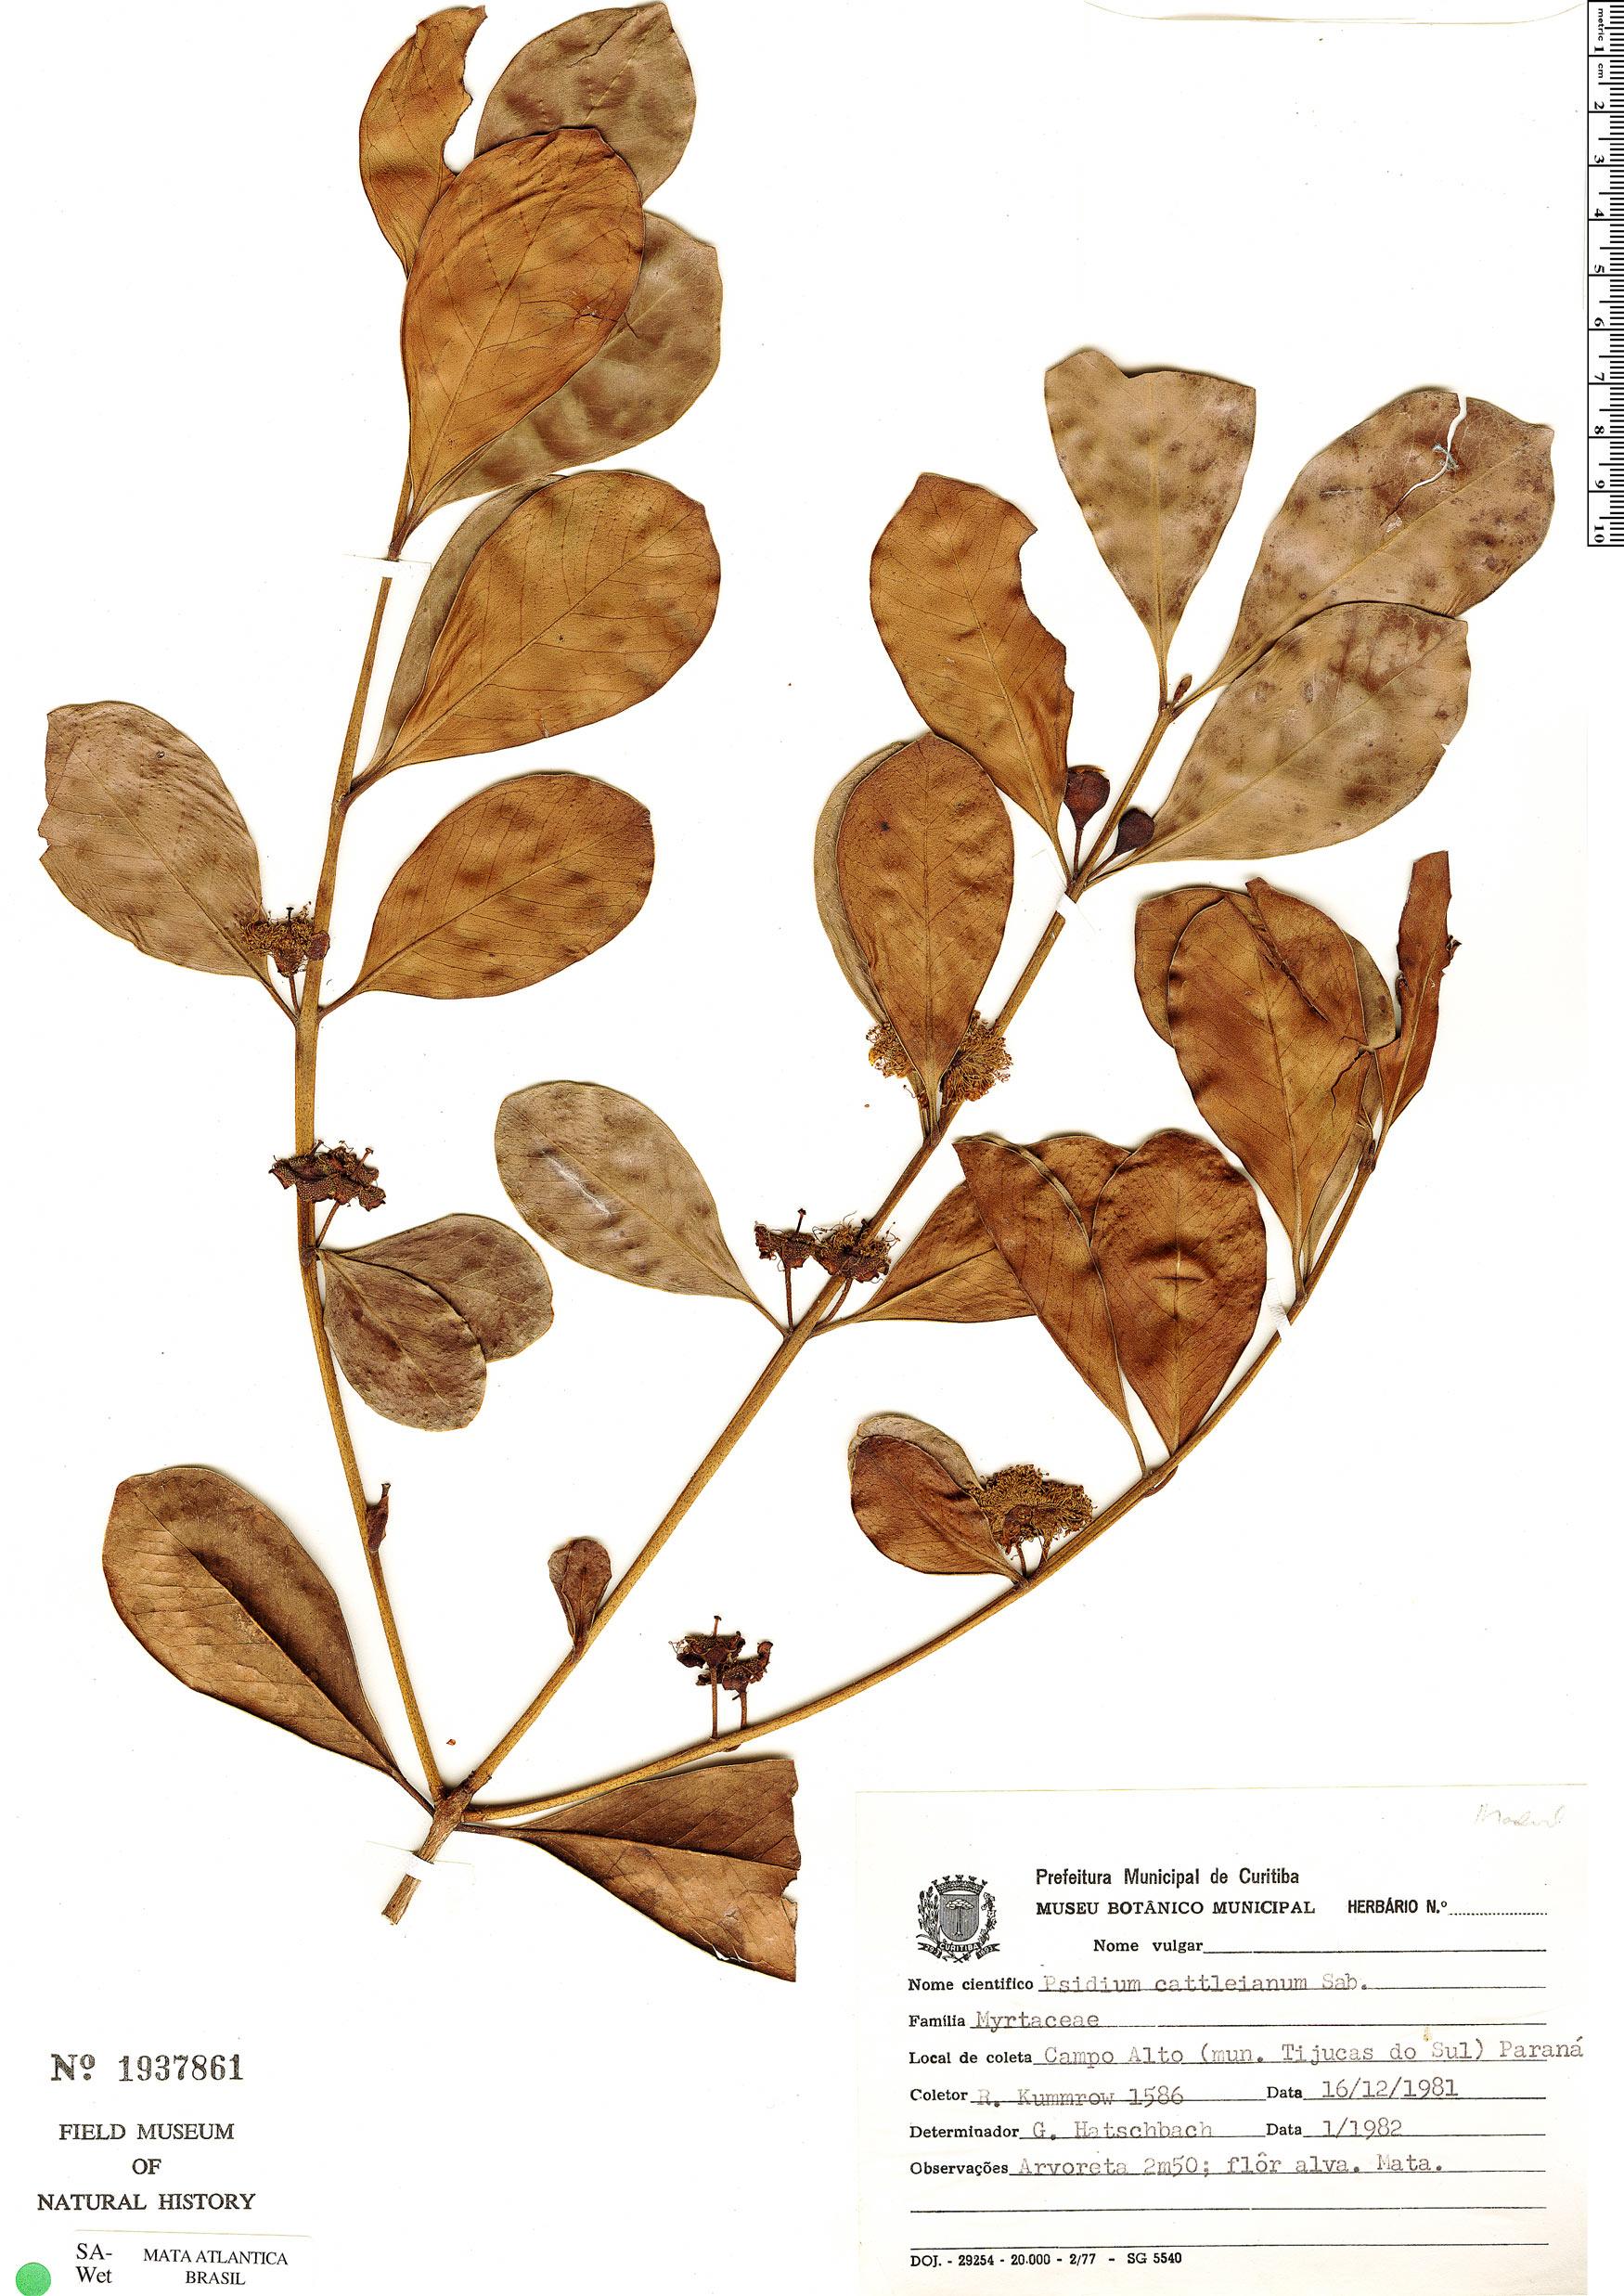 Espécime: Psidium cattleyanum